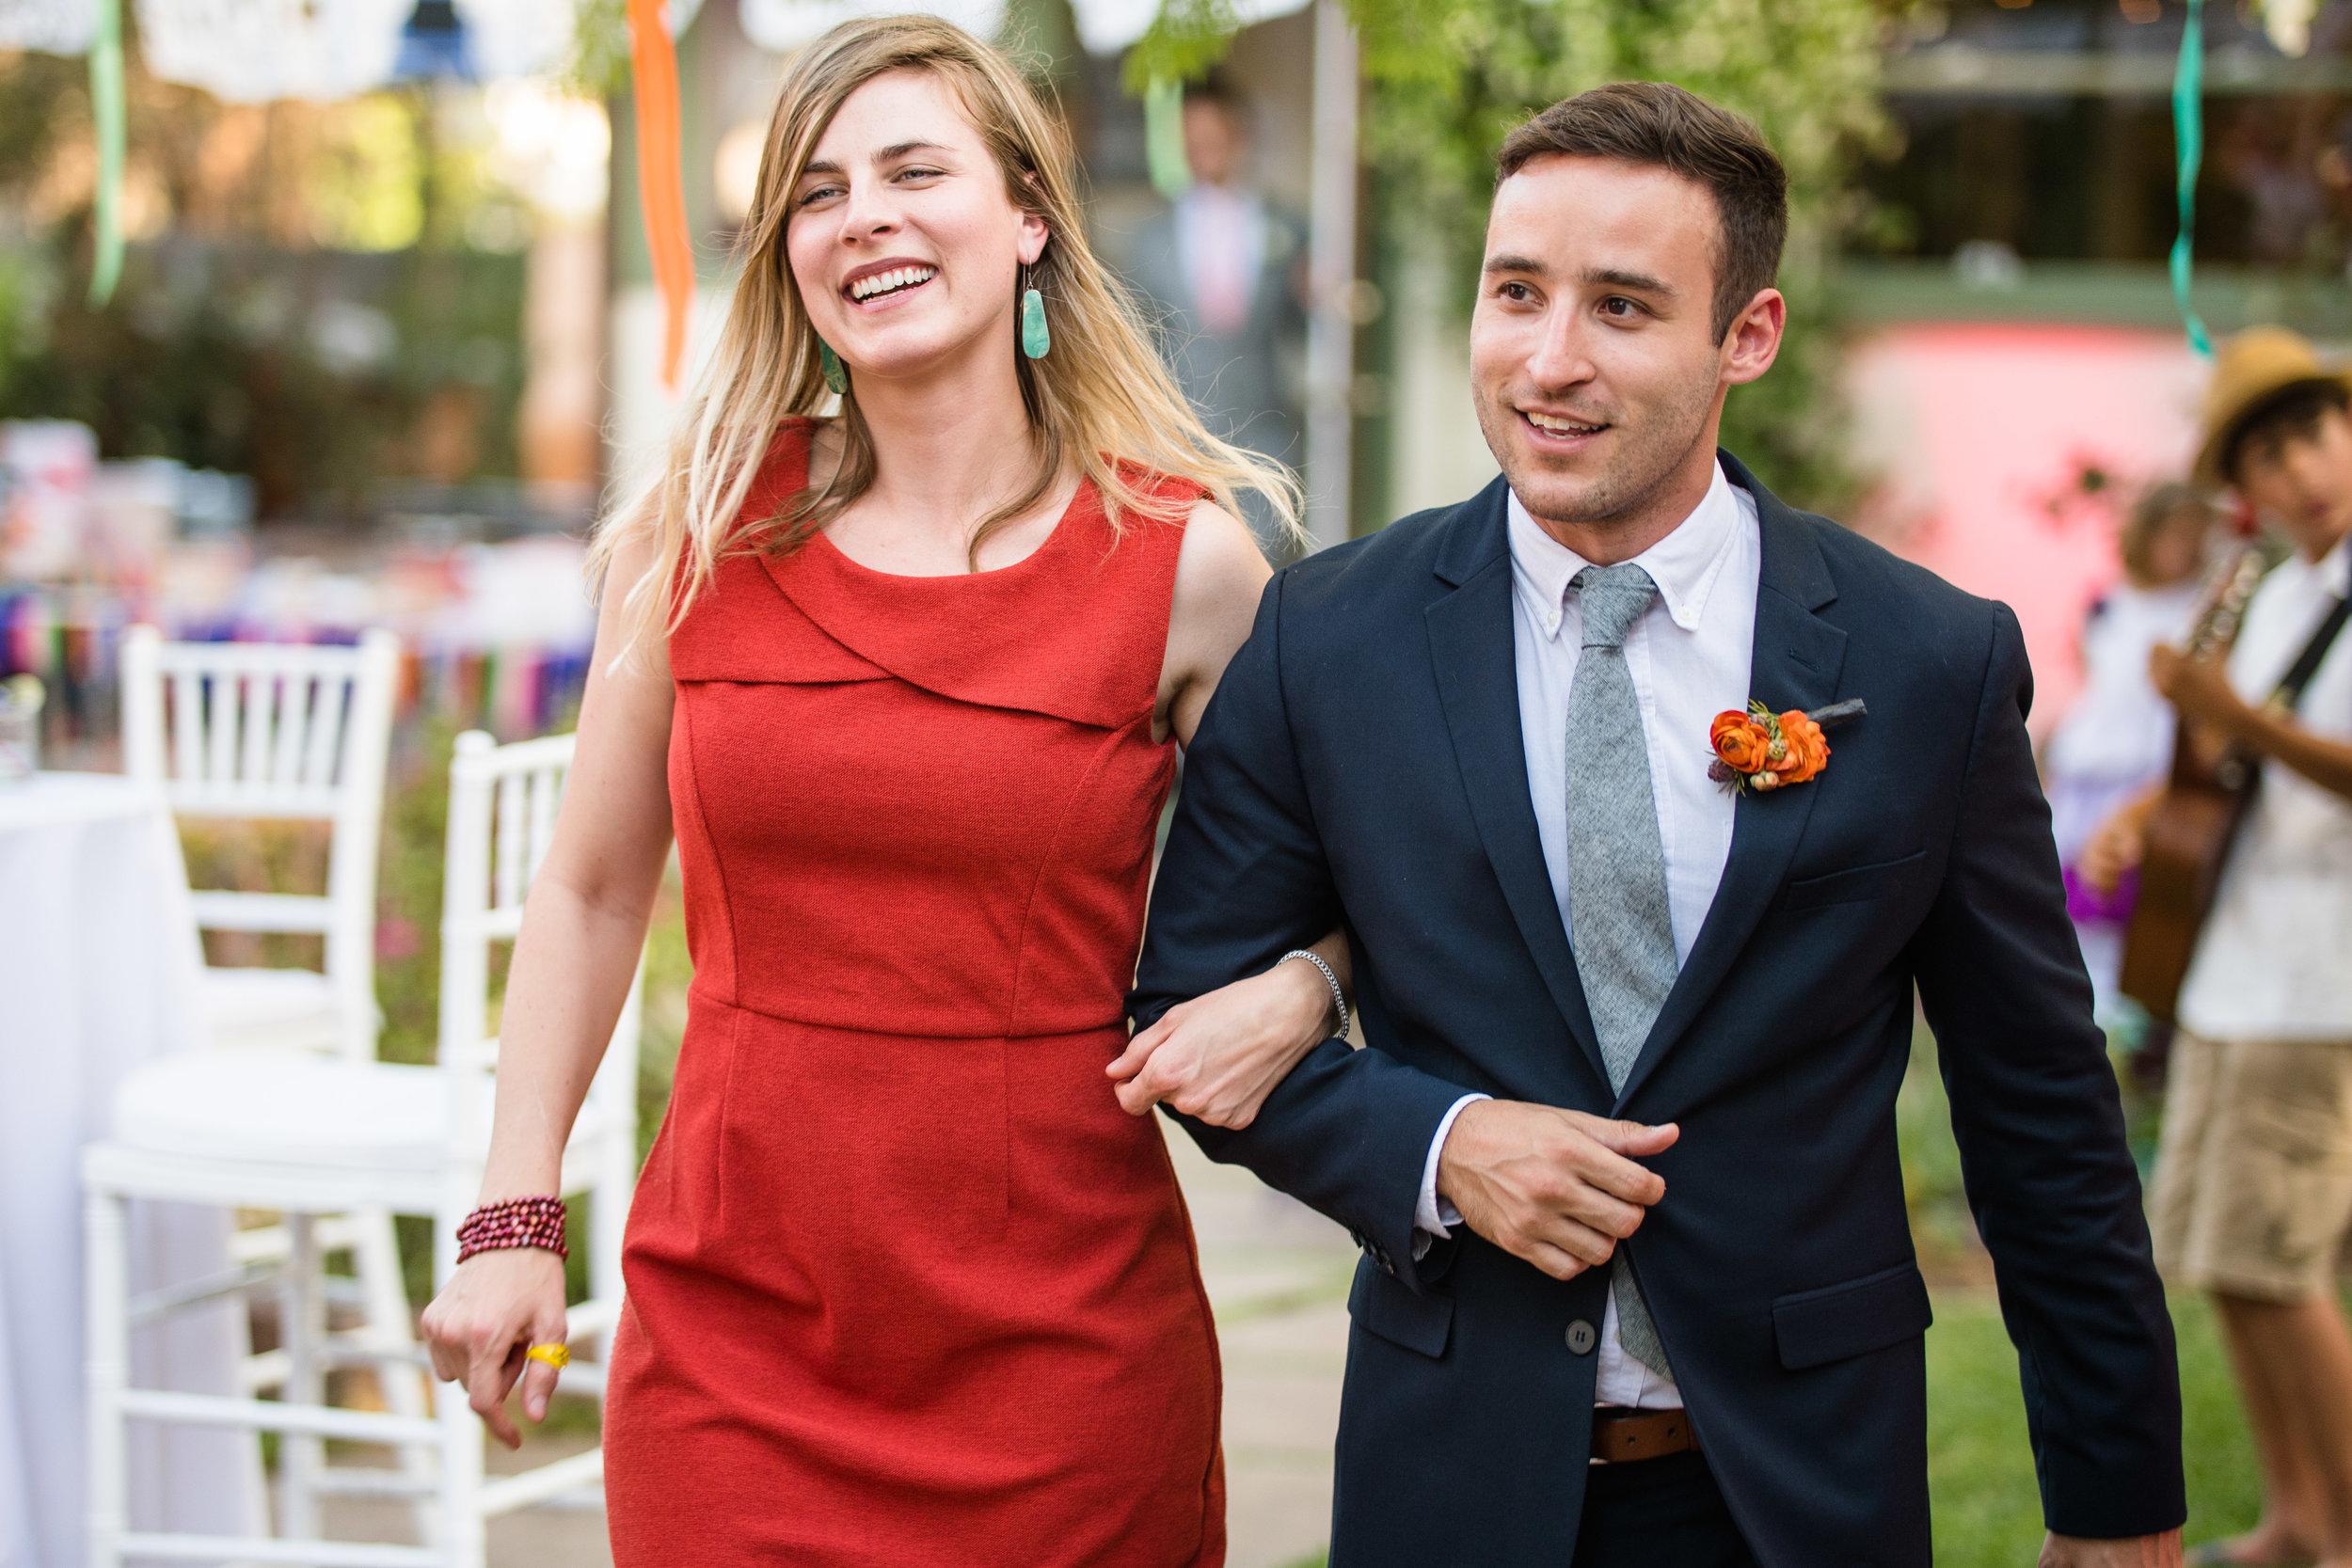 Vibrant Fiesta Backyard Wedding Reception bridesmaid in red.jpg